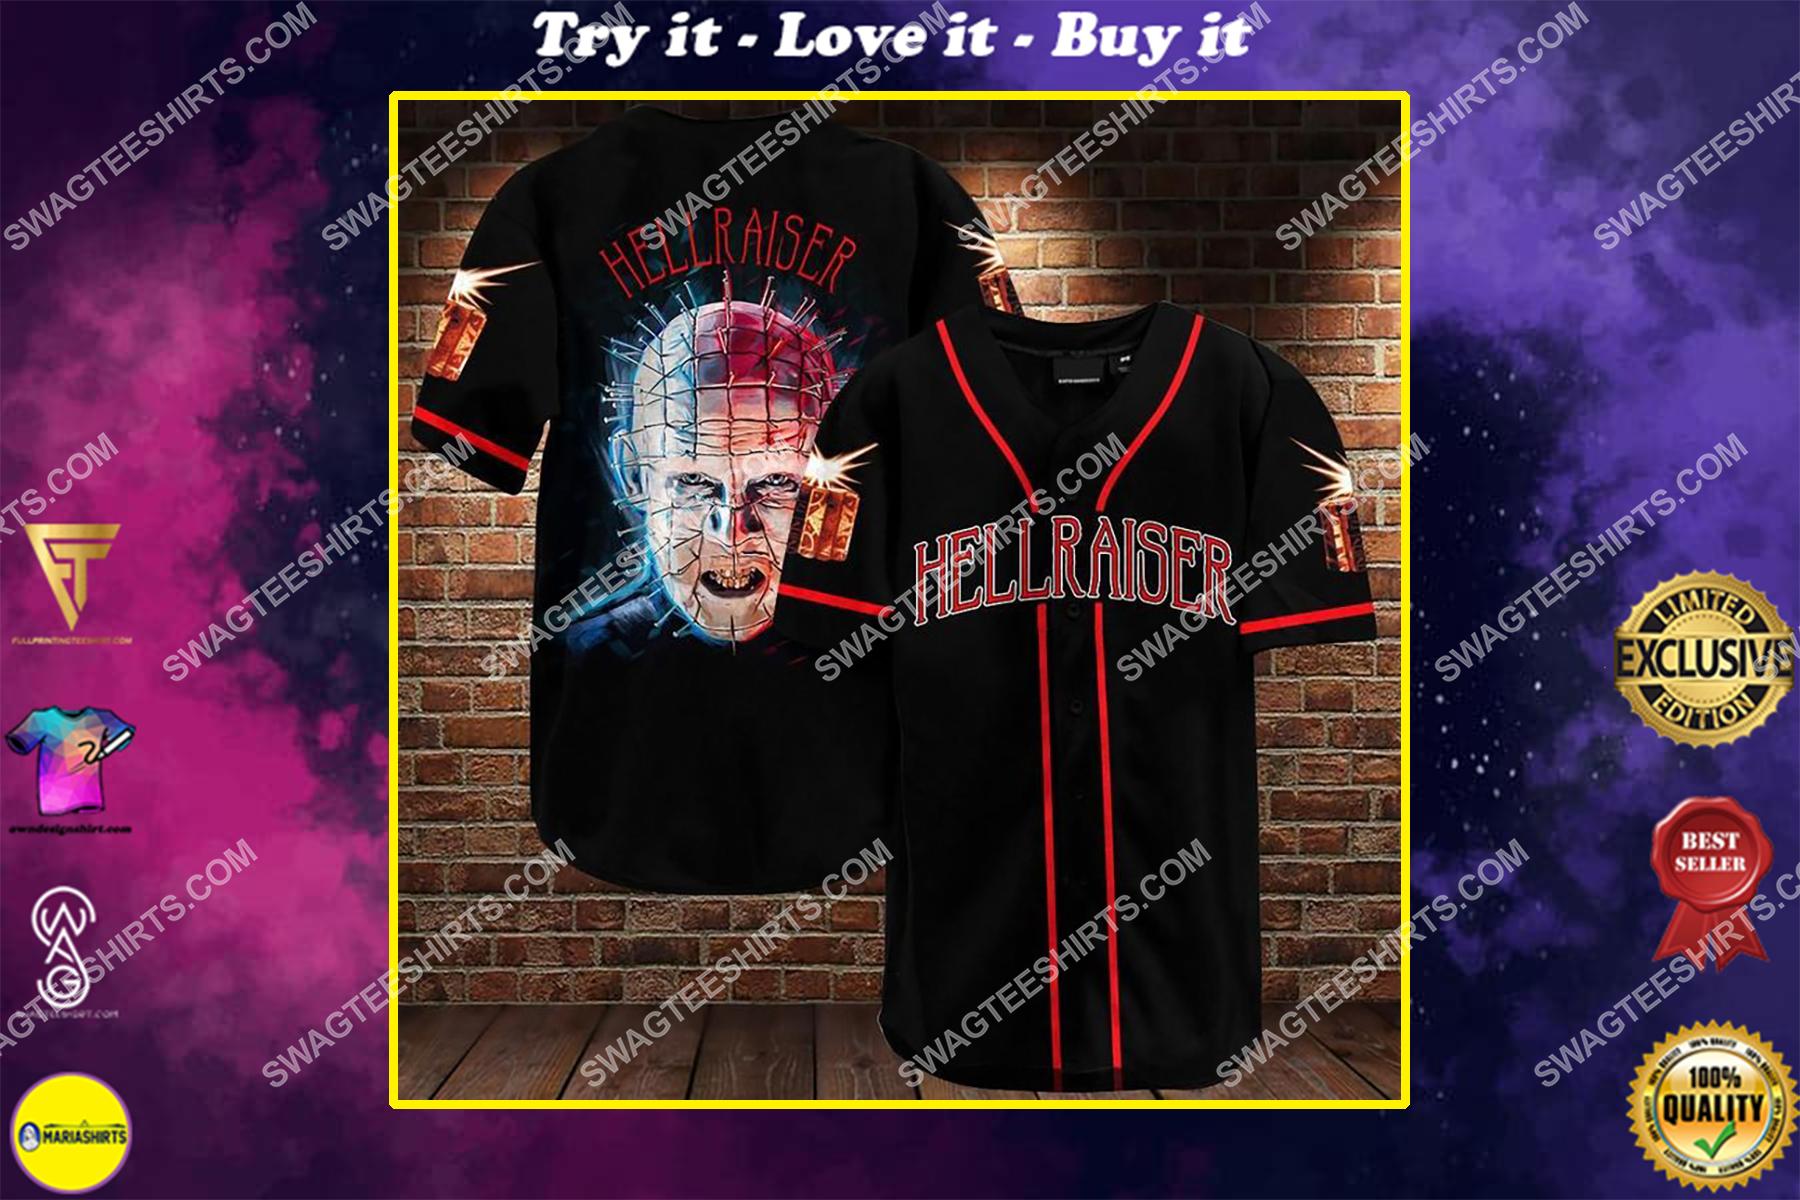 the hellraiser movie all over printed baseball shirt